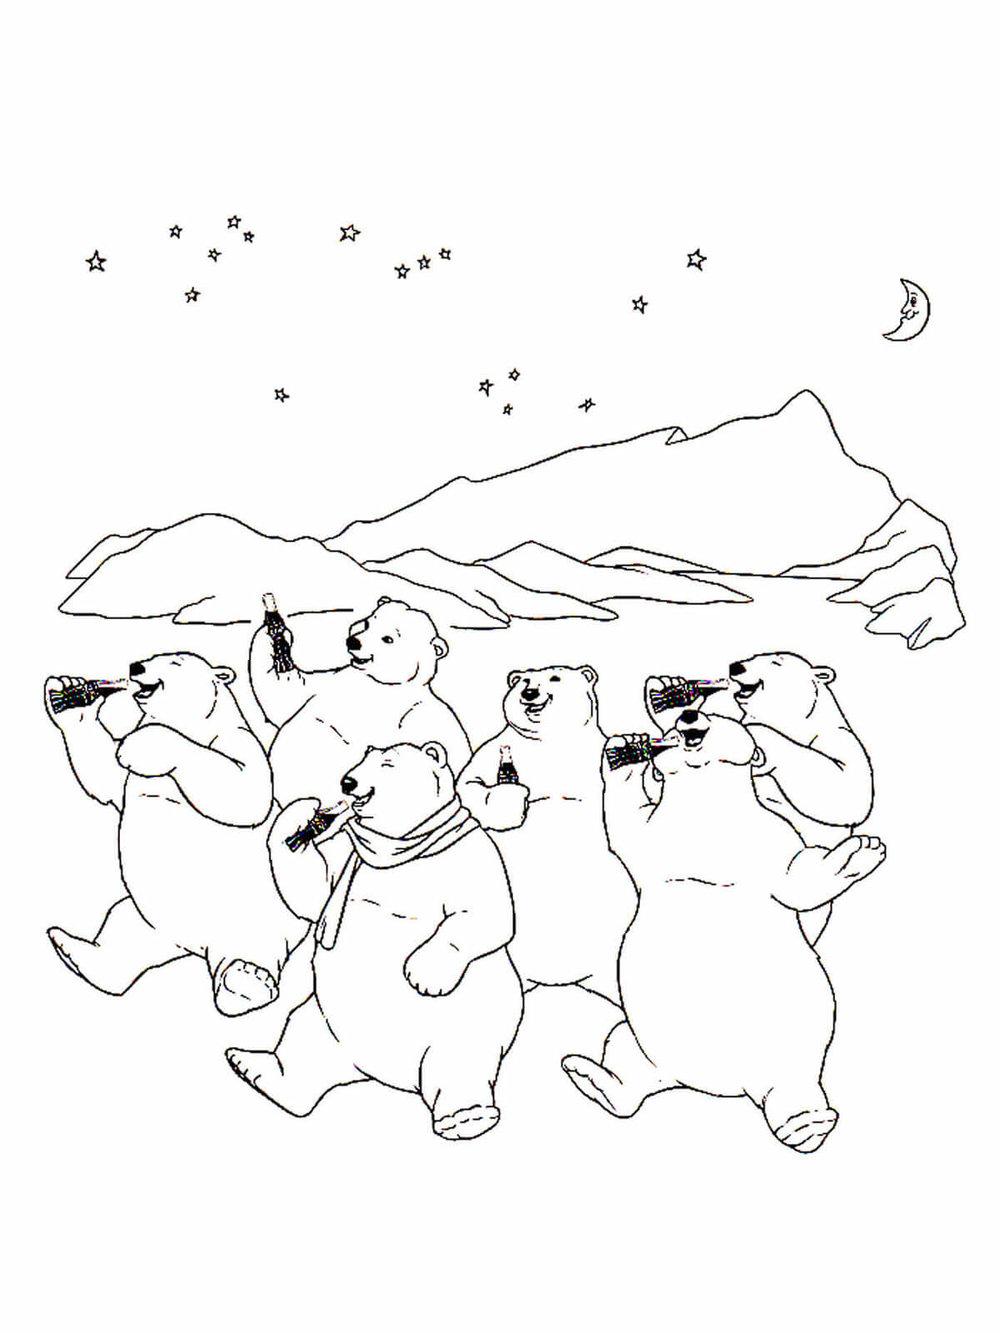 Group of Bears under the Aurora Borealis.jpg